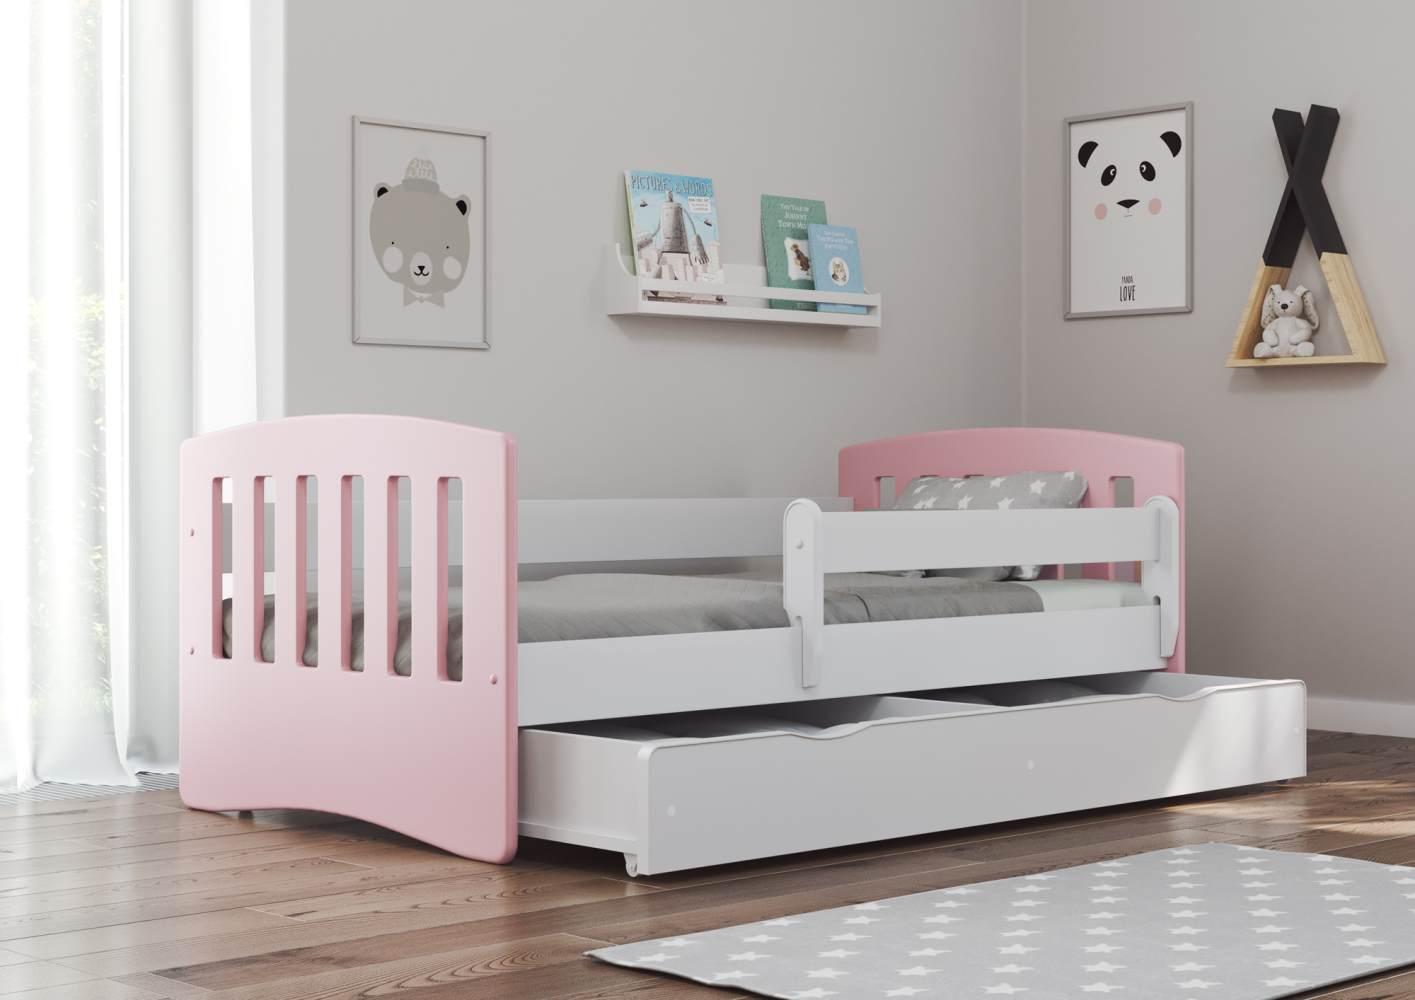 Bjird 'Classic' Kinderbett 80 x 140 cm, Puderrosa, inkl. Rausfallschutz, Lattenrost und Bettschublade Bild 1